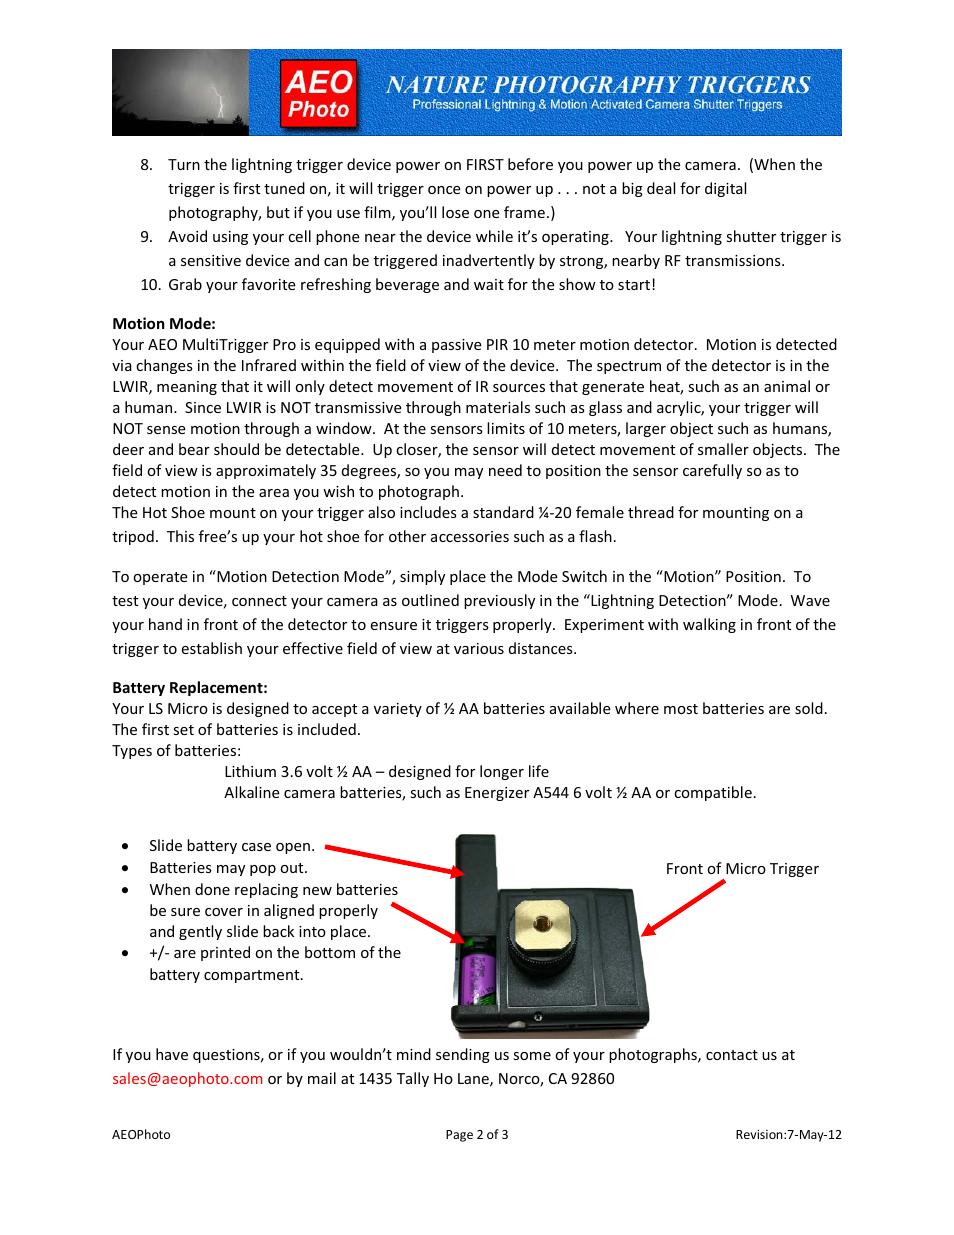 AEO Photo Micro MT Pro 3 0 User Manual | Page 2 / 3